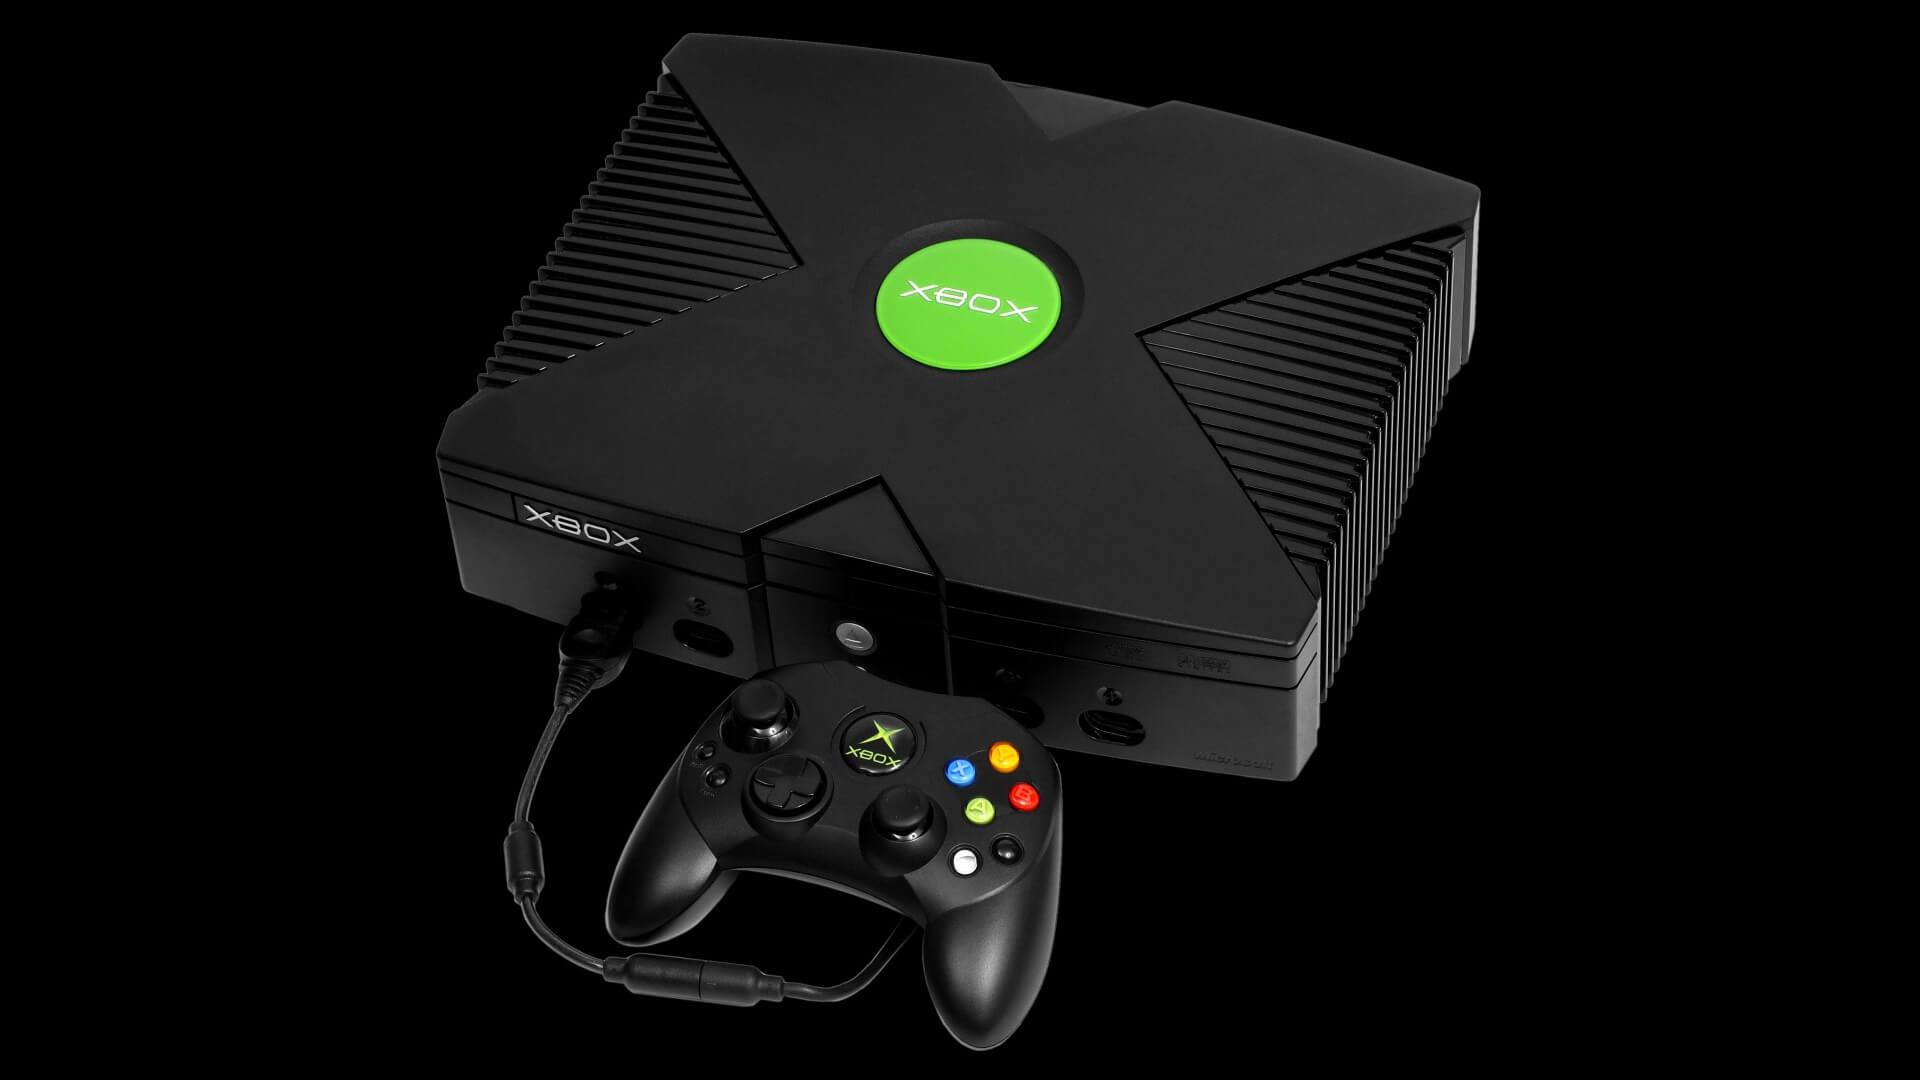 Original Xbox Games For Xbox : Original xbox added to one backwards compatibility